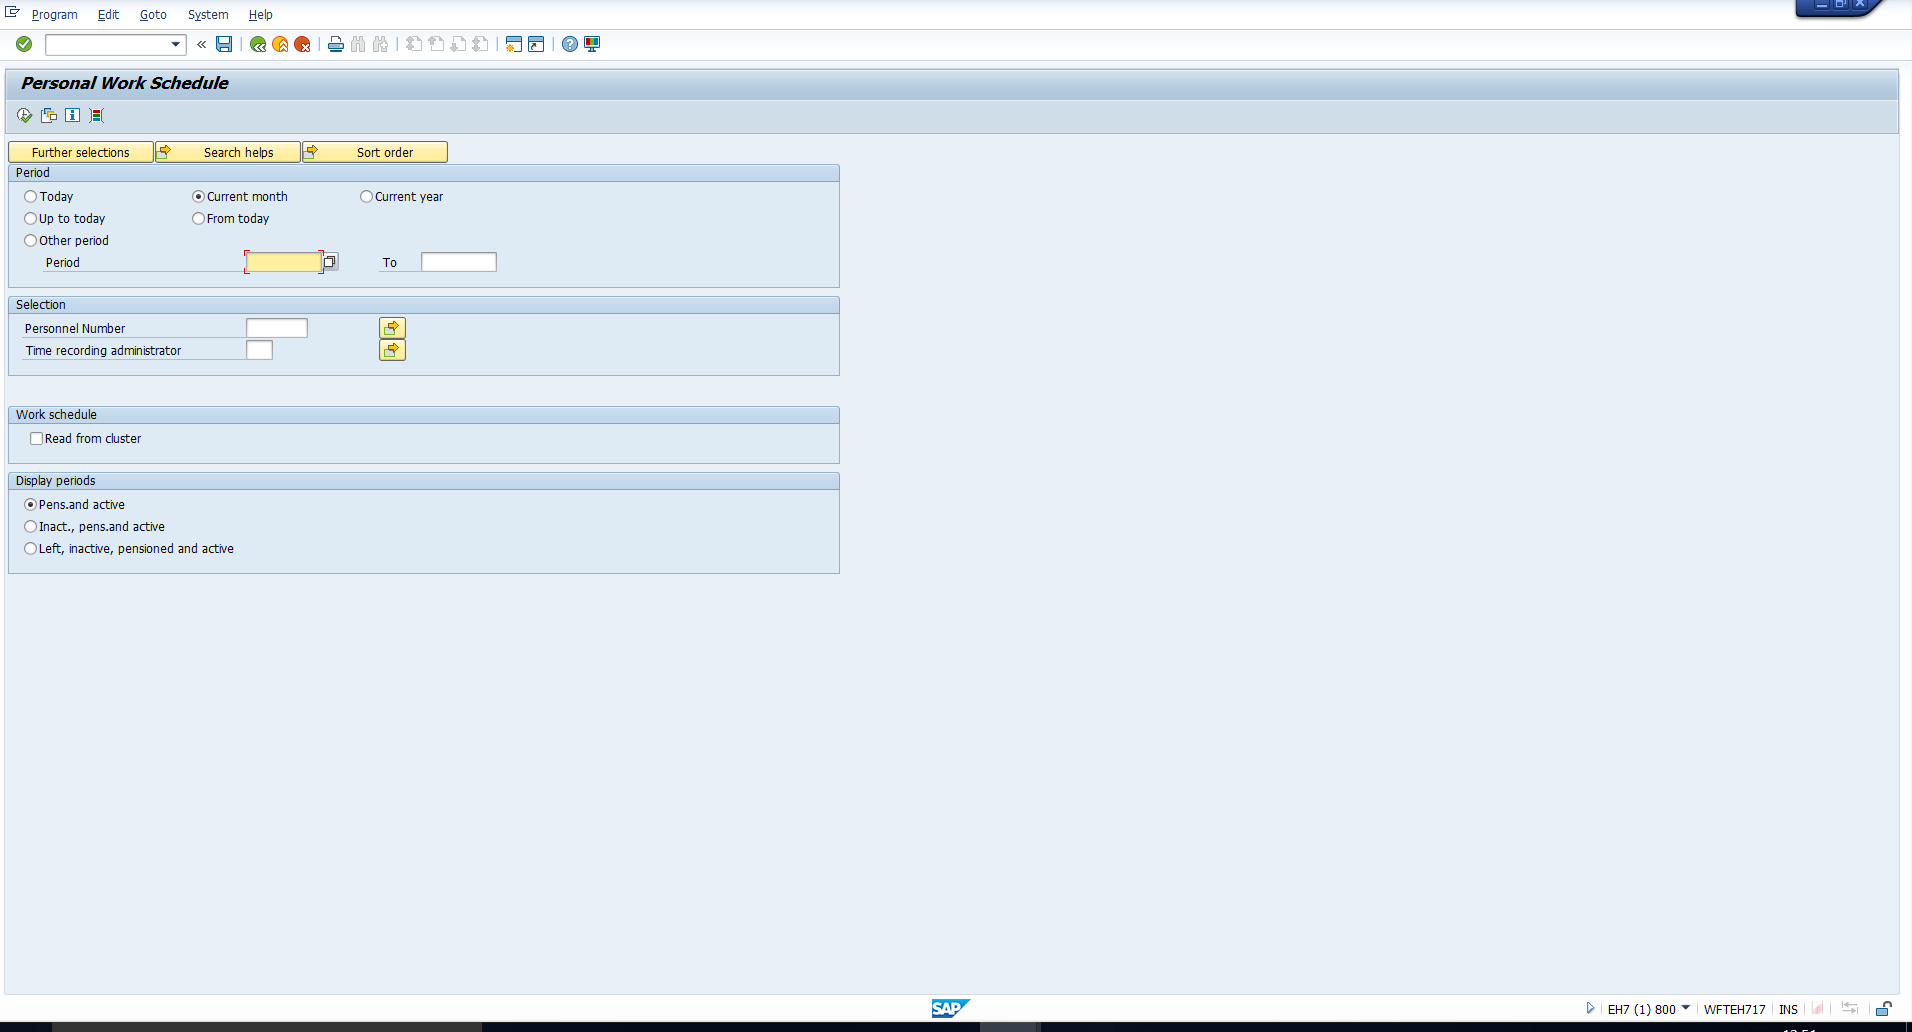 Figure 2: Selection Screen